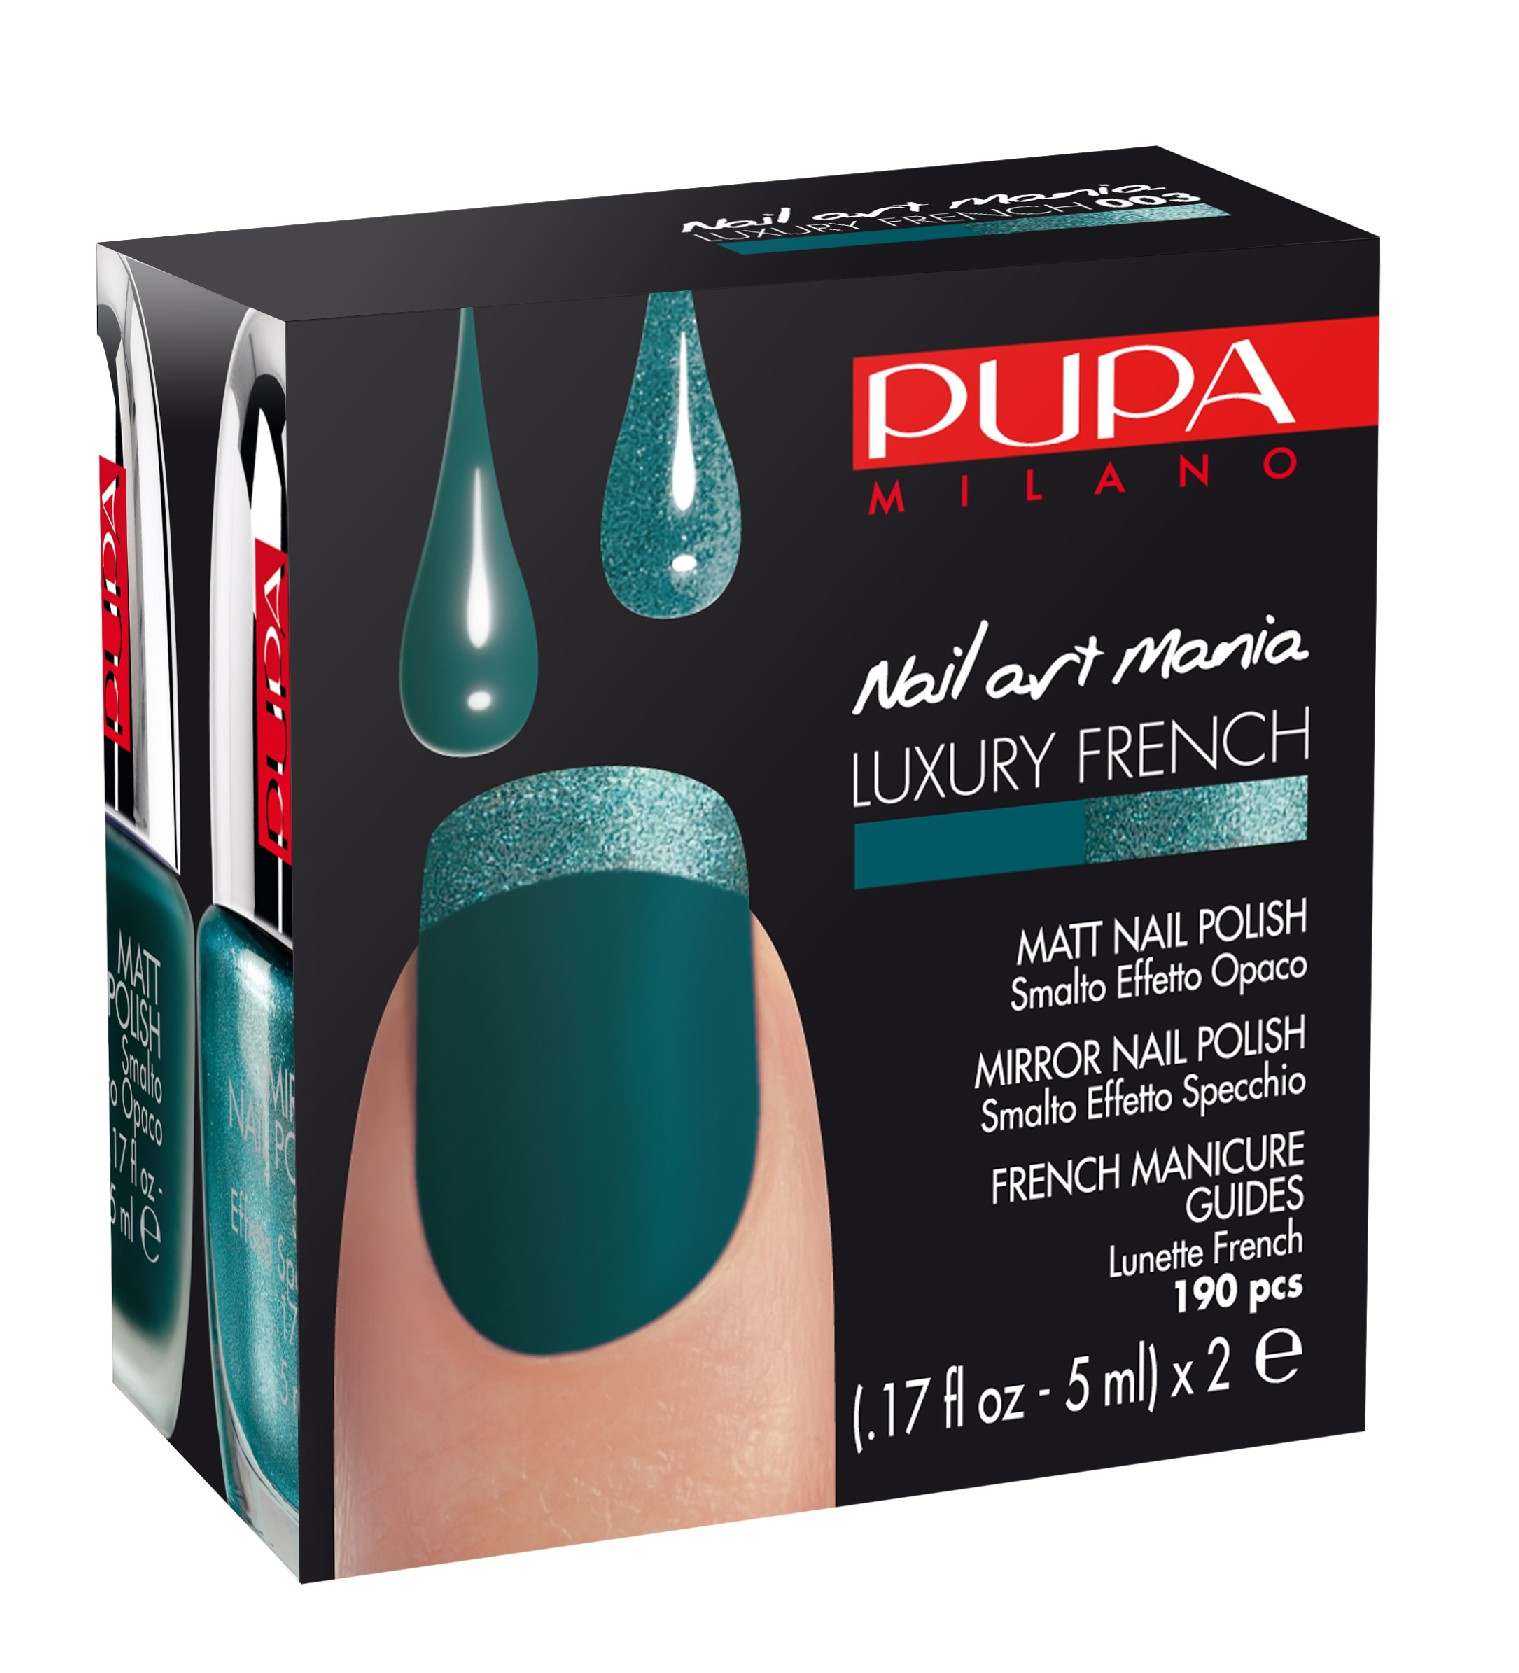 Nail Art Mania - Luxury French Matt Nail Polish - Mirror Nail Polish - pack1